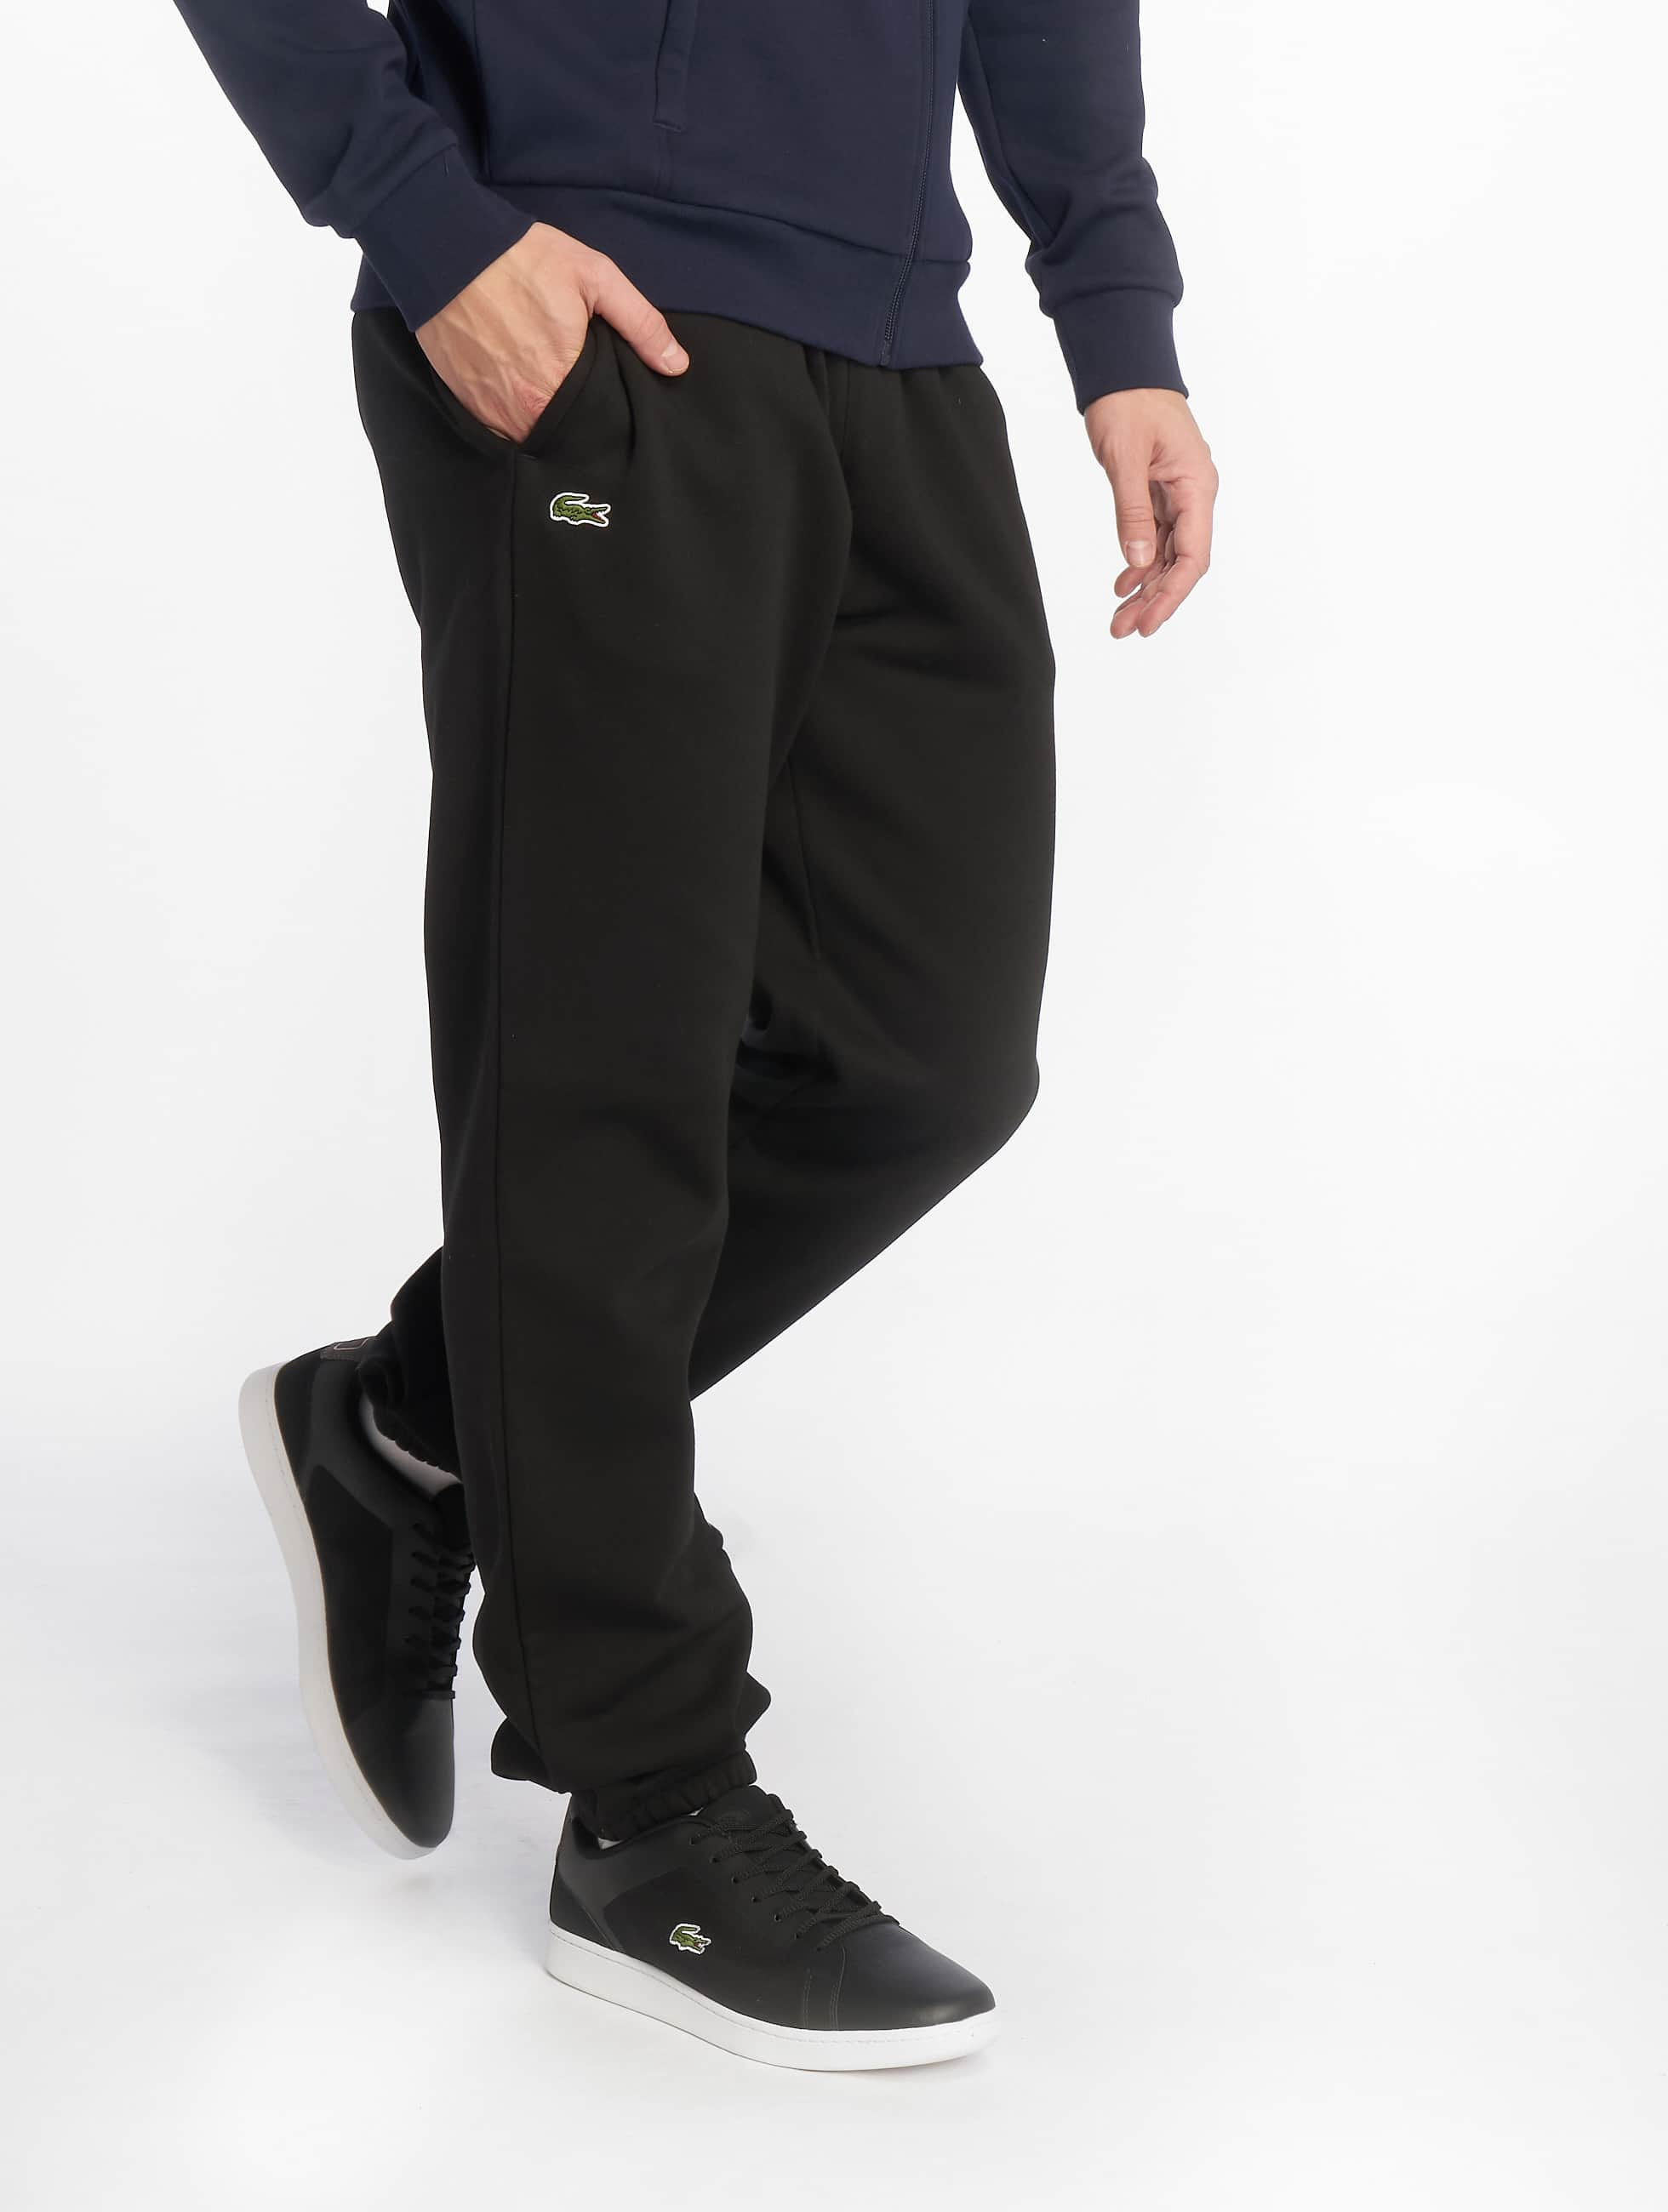 lacoste classic herren jogginghose classic in schwarz 210770. Black Bedroom Furniture Sets. Home Design Ideas